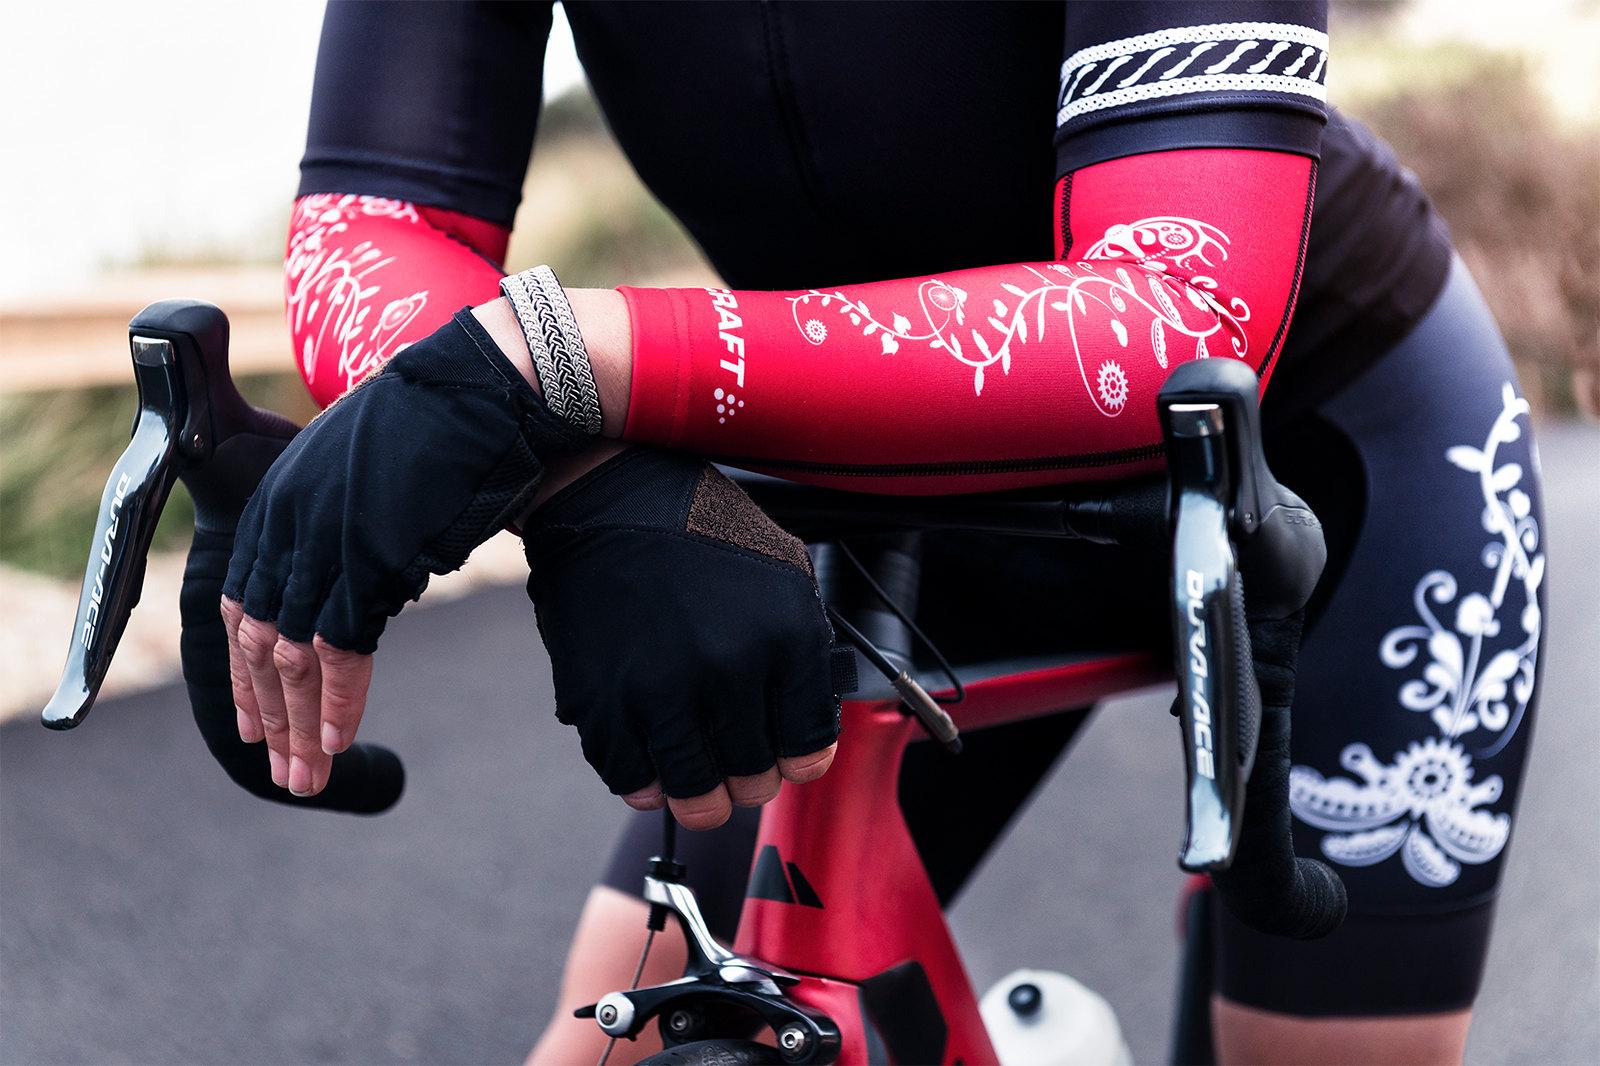 Cykelkurbits, design av Sofie Lantto. Foto Hans Berggren.